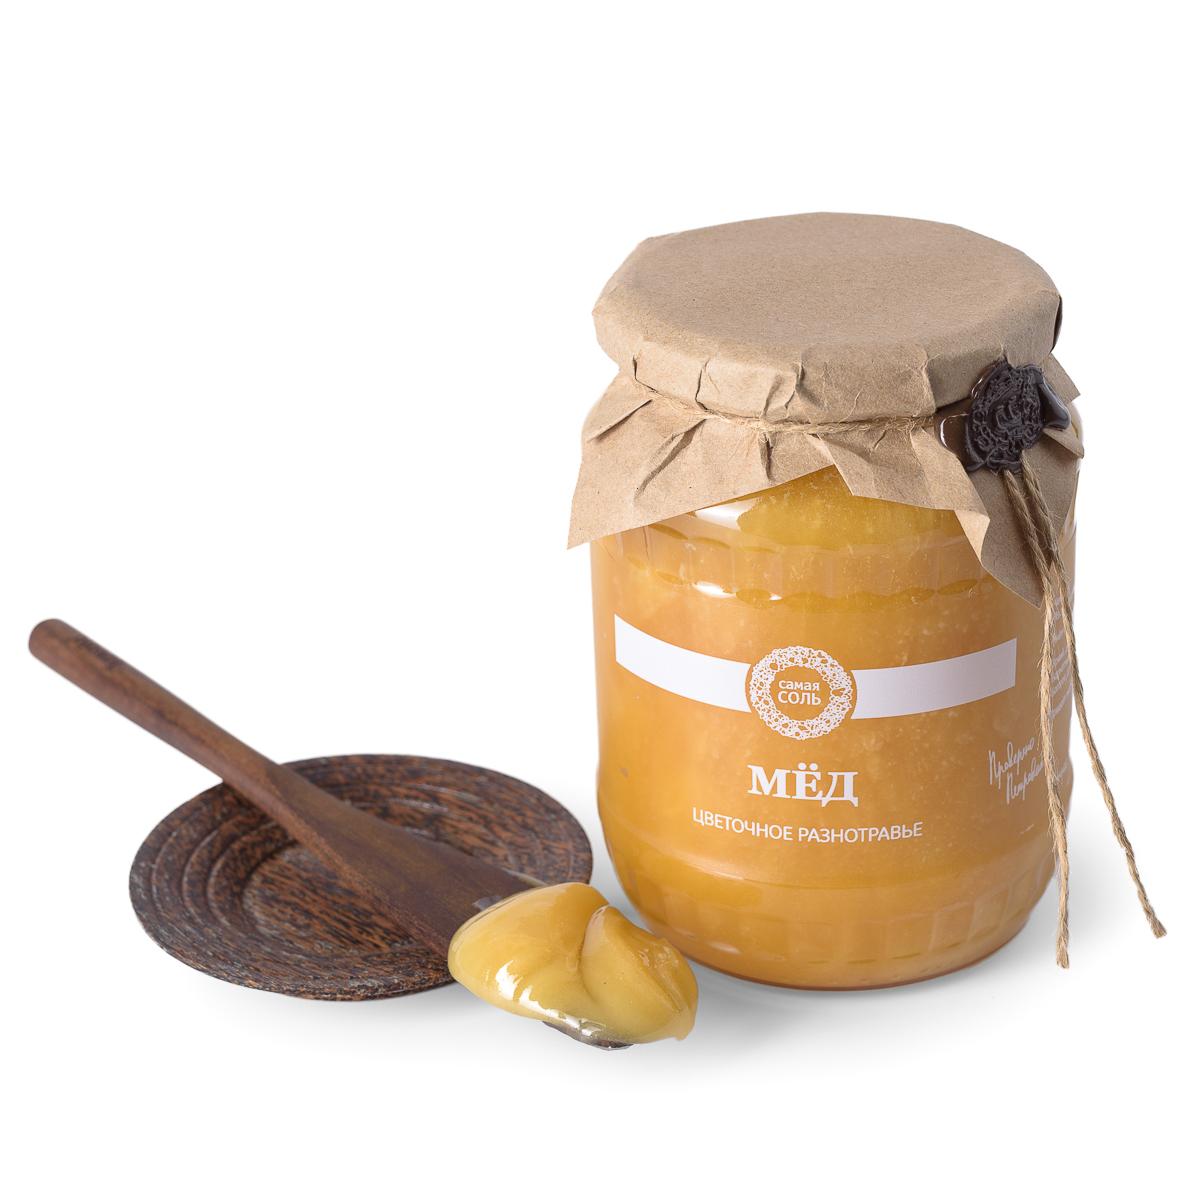 Мёд разнотравье